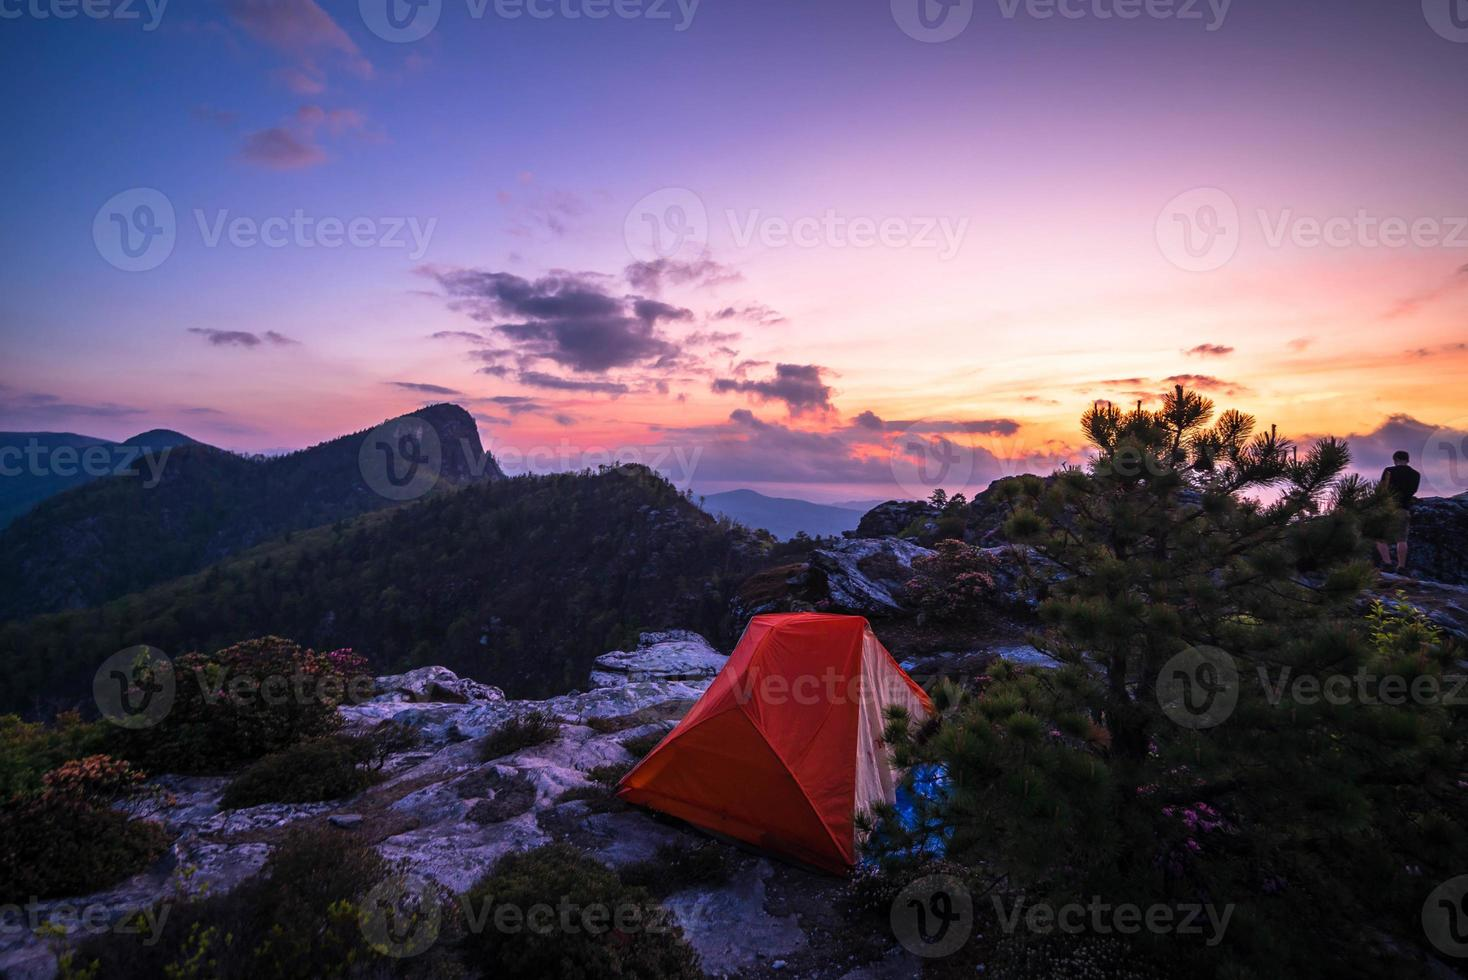 barraca de acampamento na área selvagem de linville gorge foto